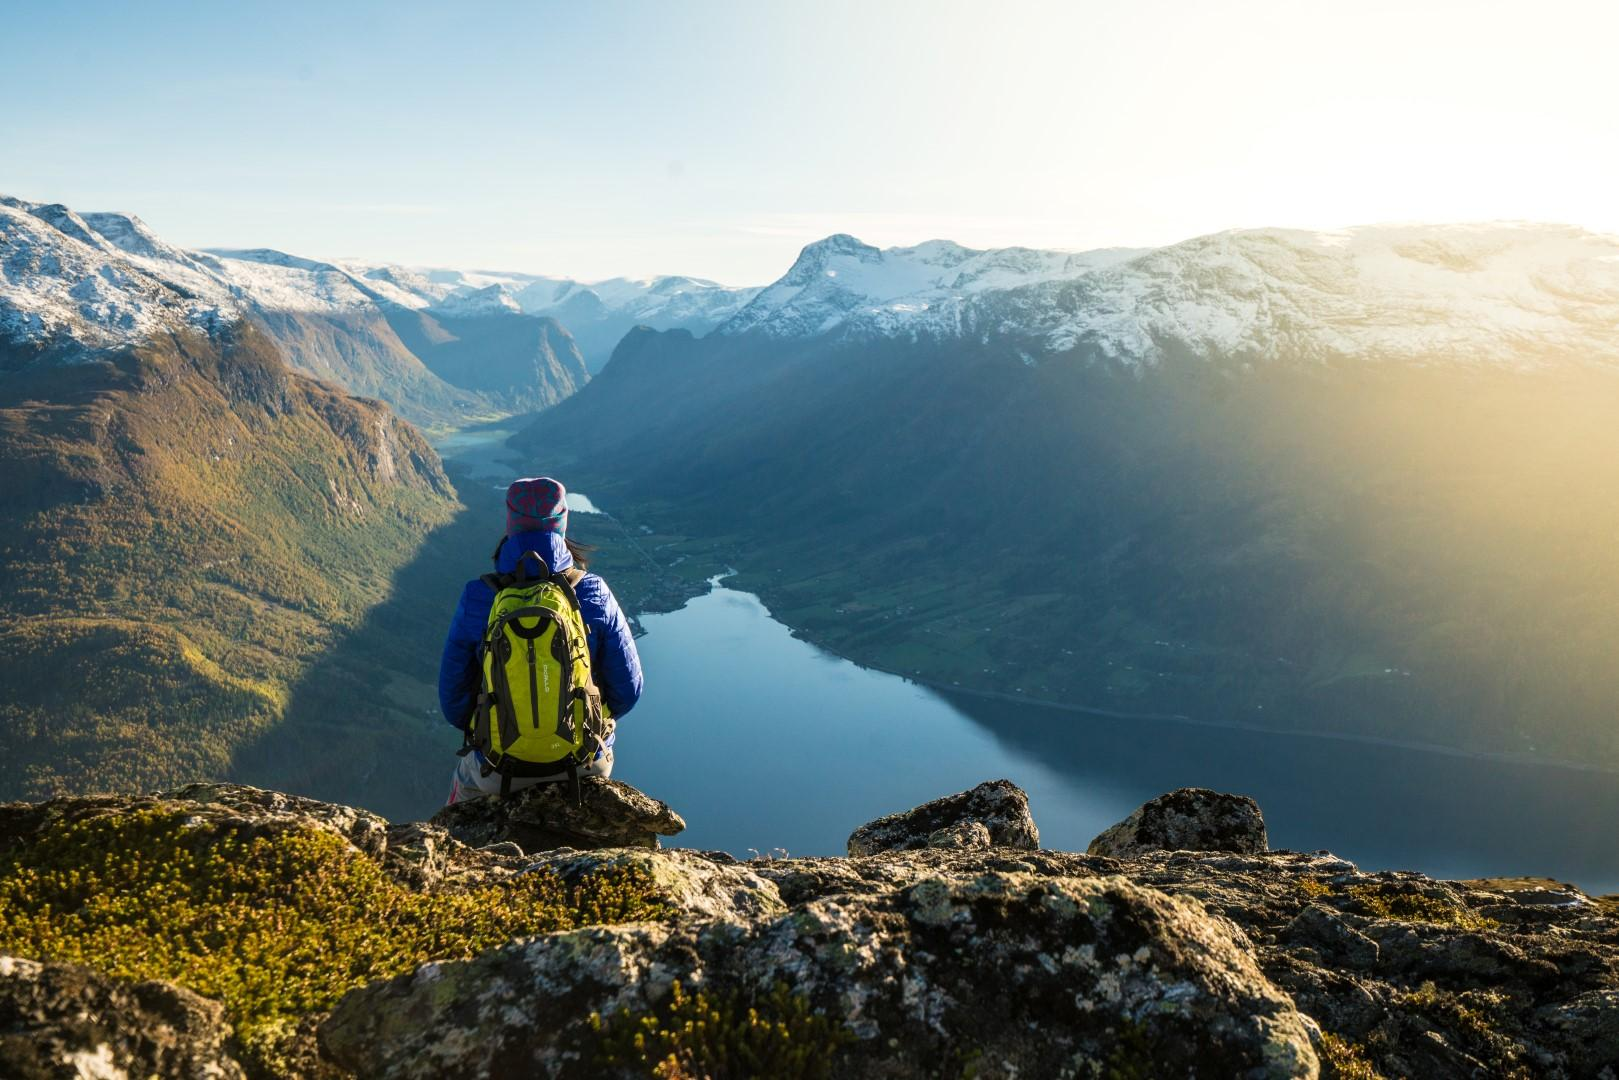 La vertiginosa funivia del Nordfjord in Norvegia